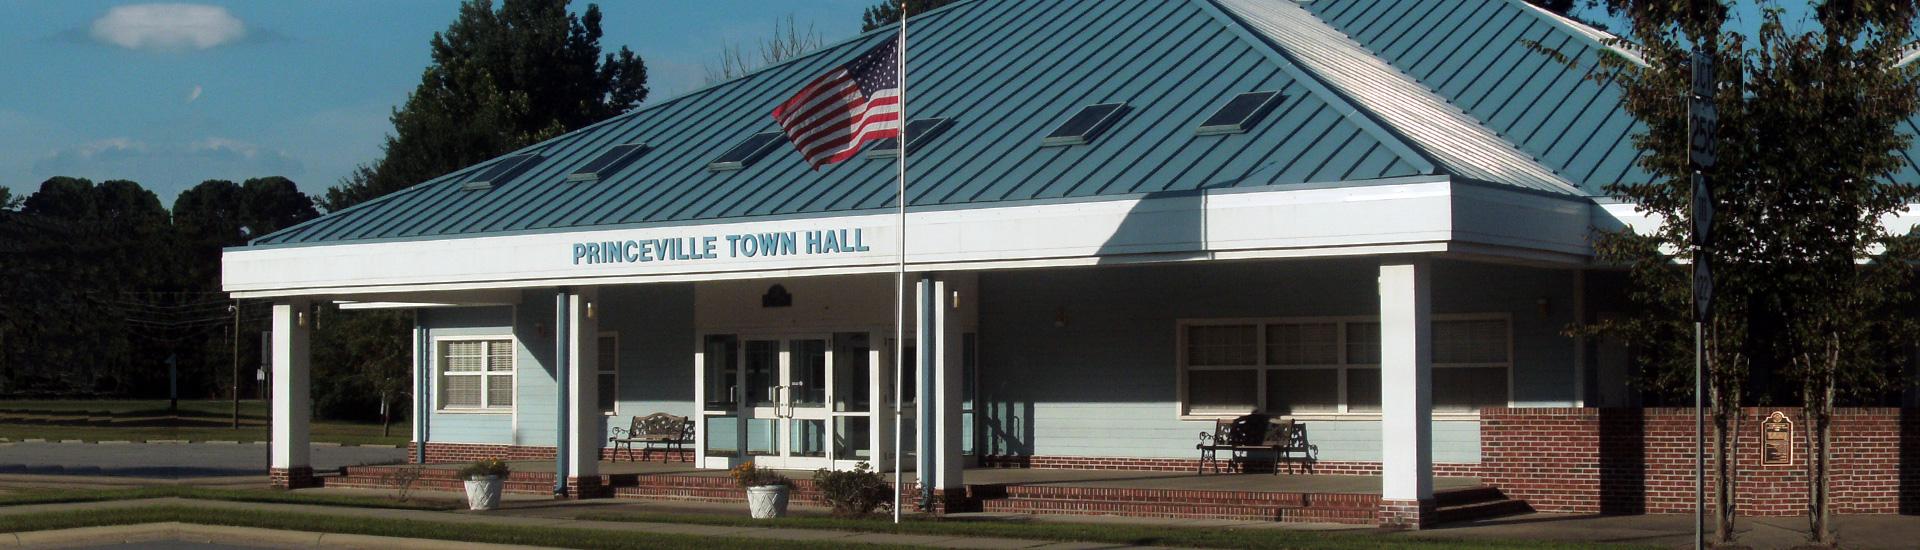 princeville-town-hall-3